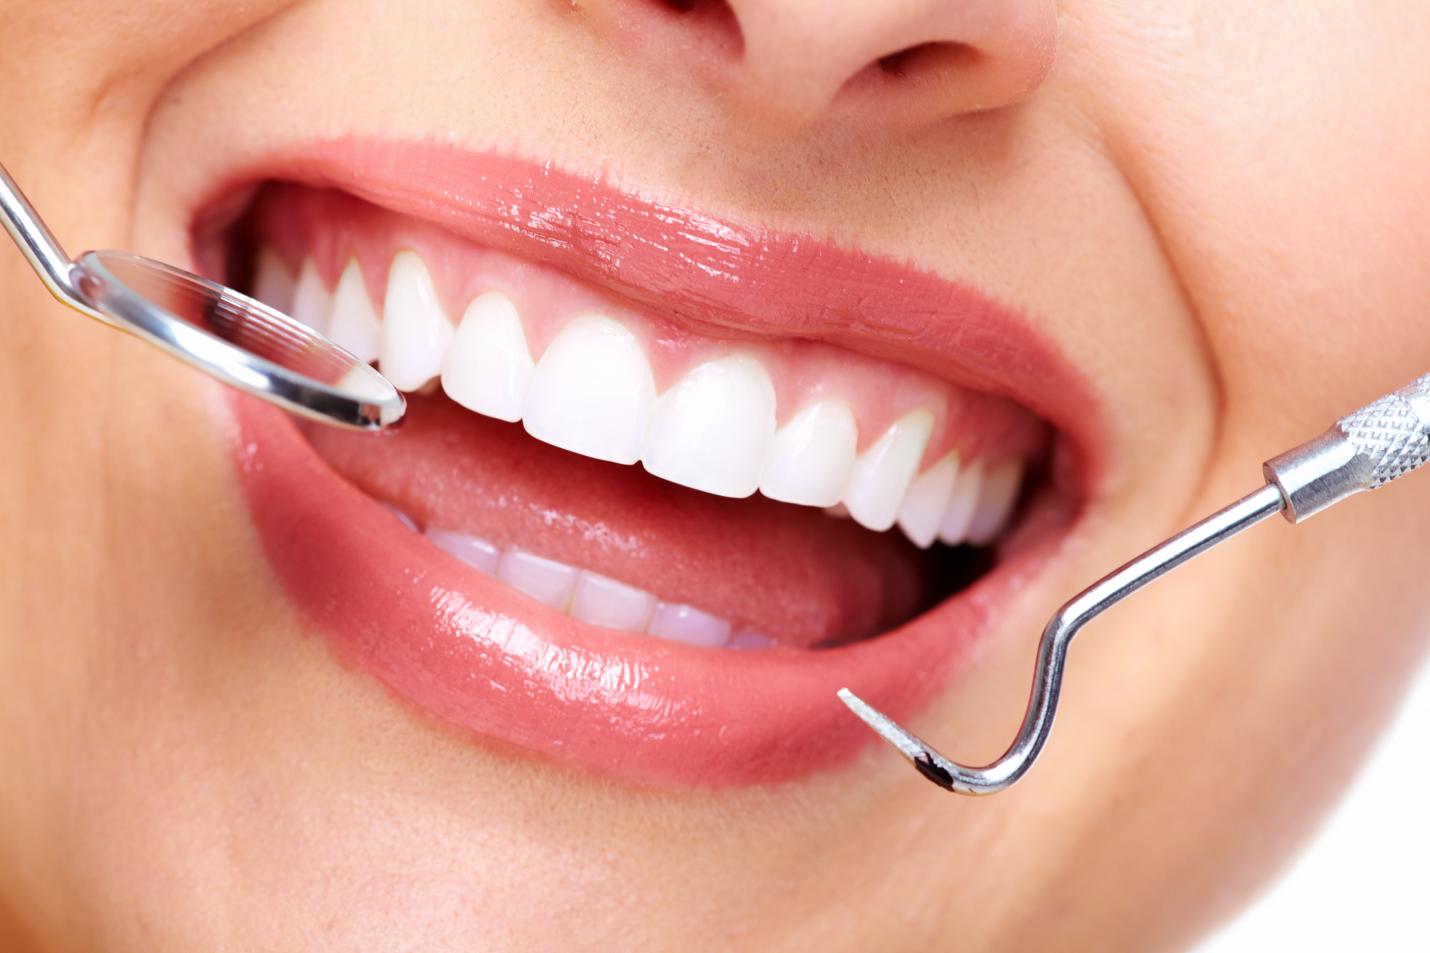 dental smile. shutterstock_63856075. Meet Your Doctor - Teeth Smile PNG HD